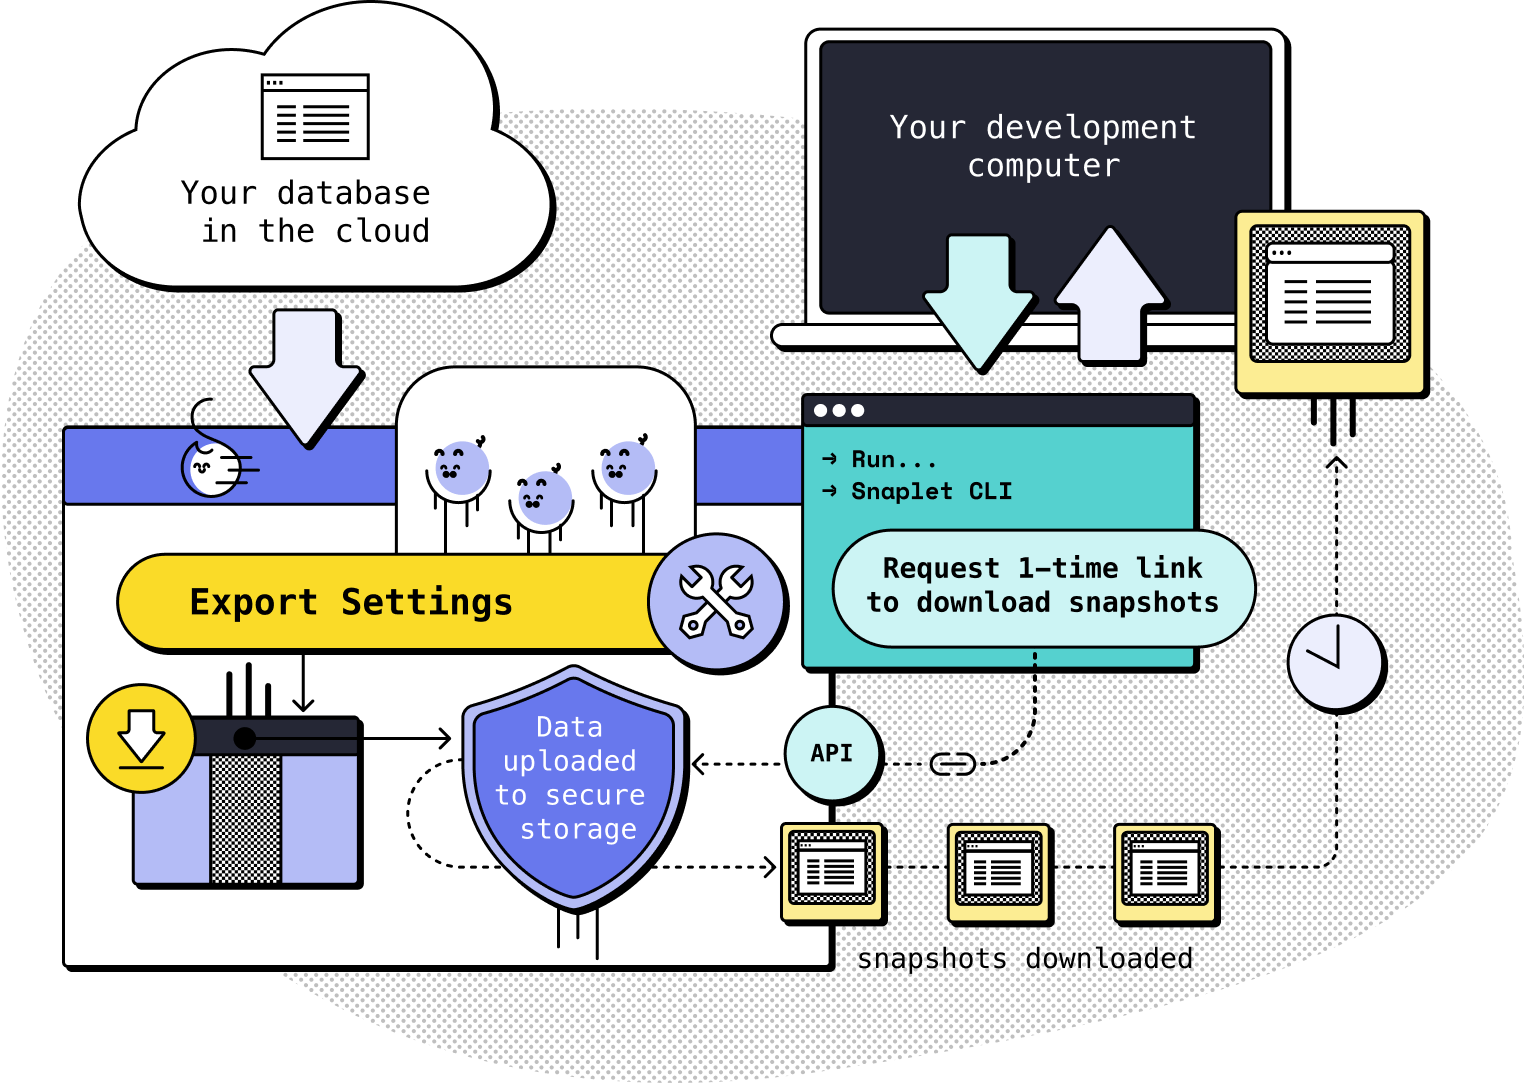 Image explaining how Snaplet works